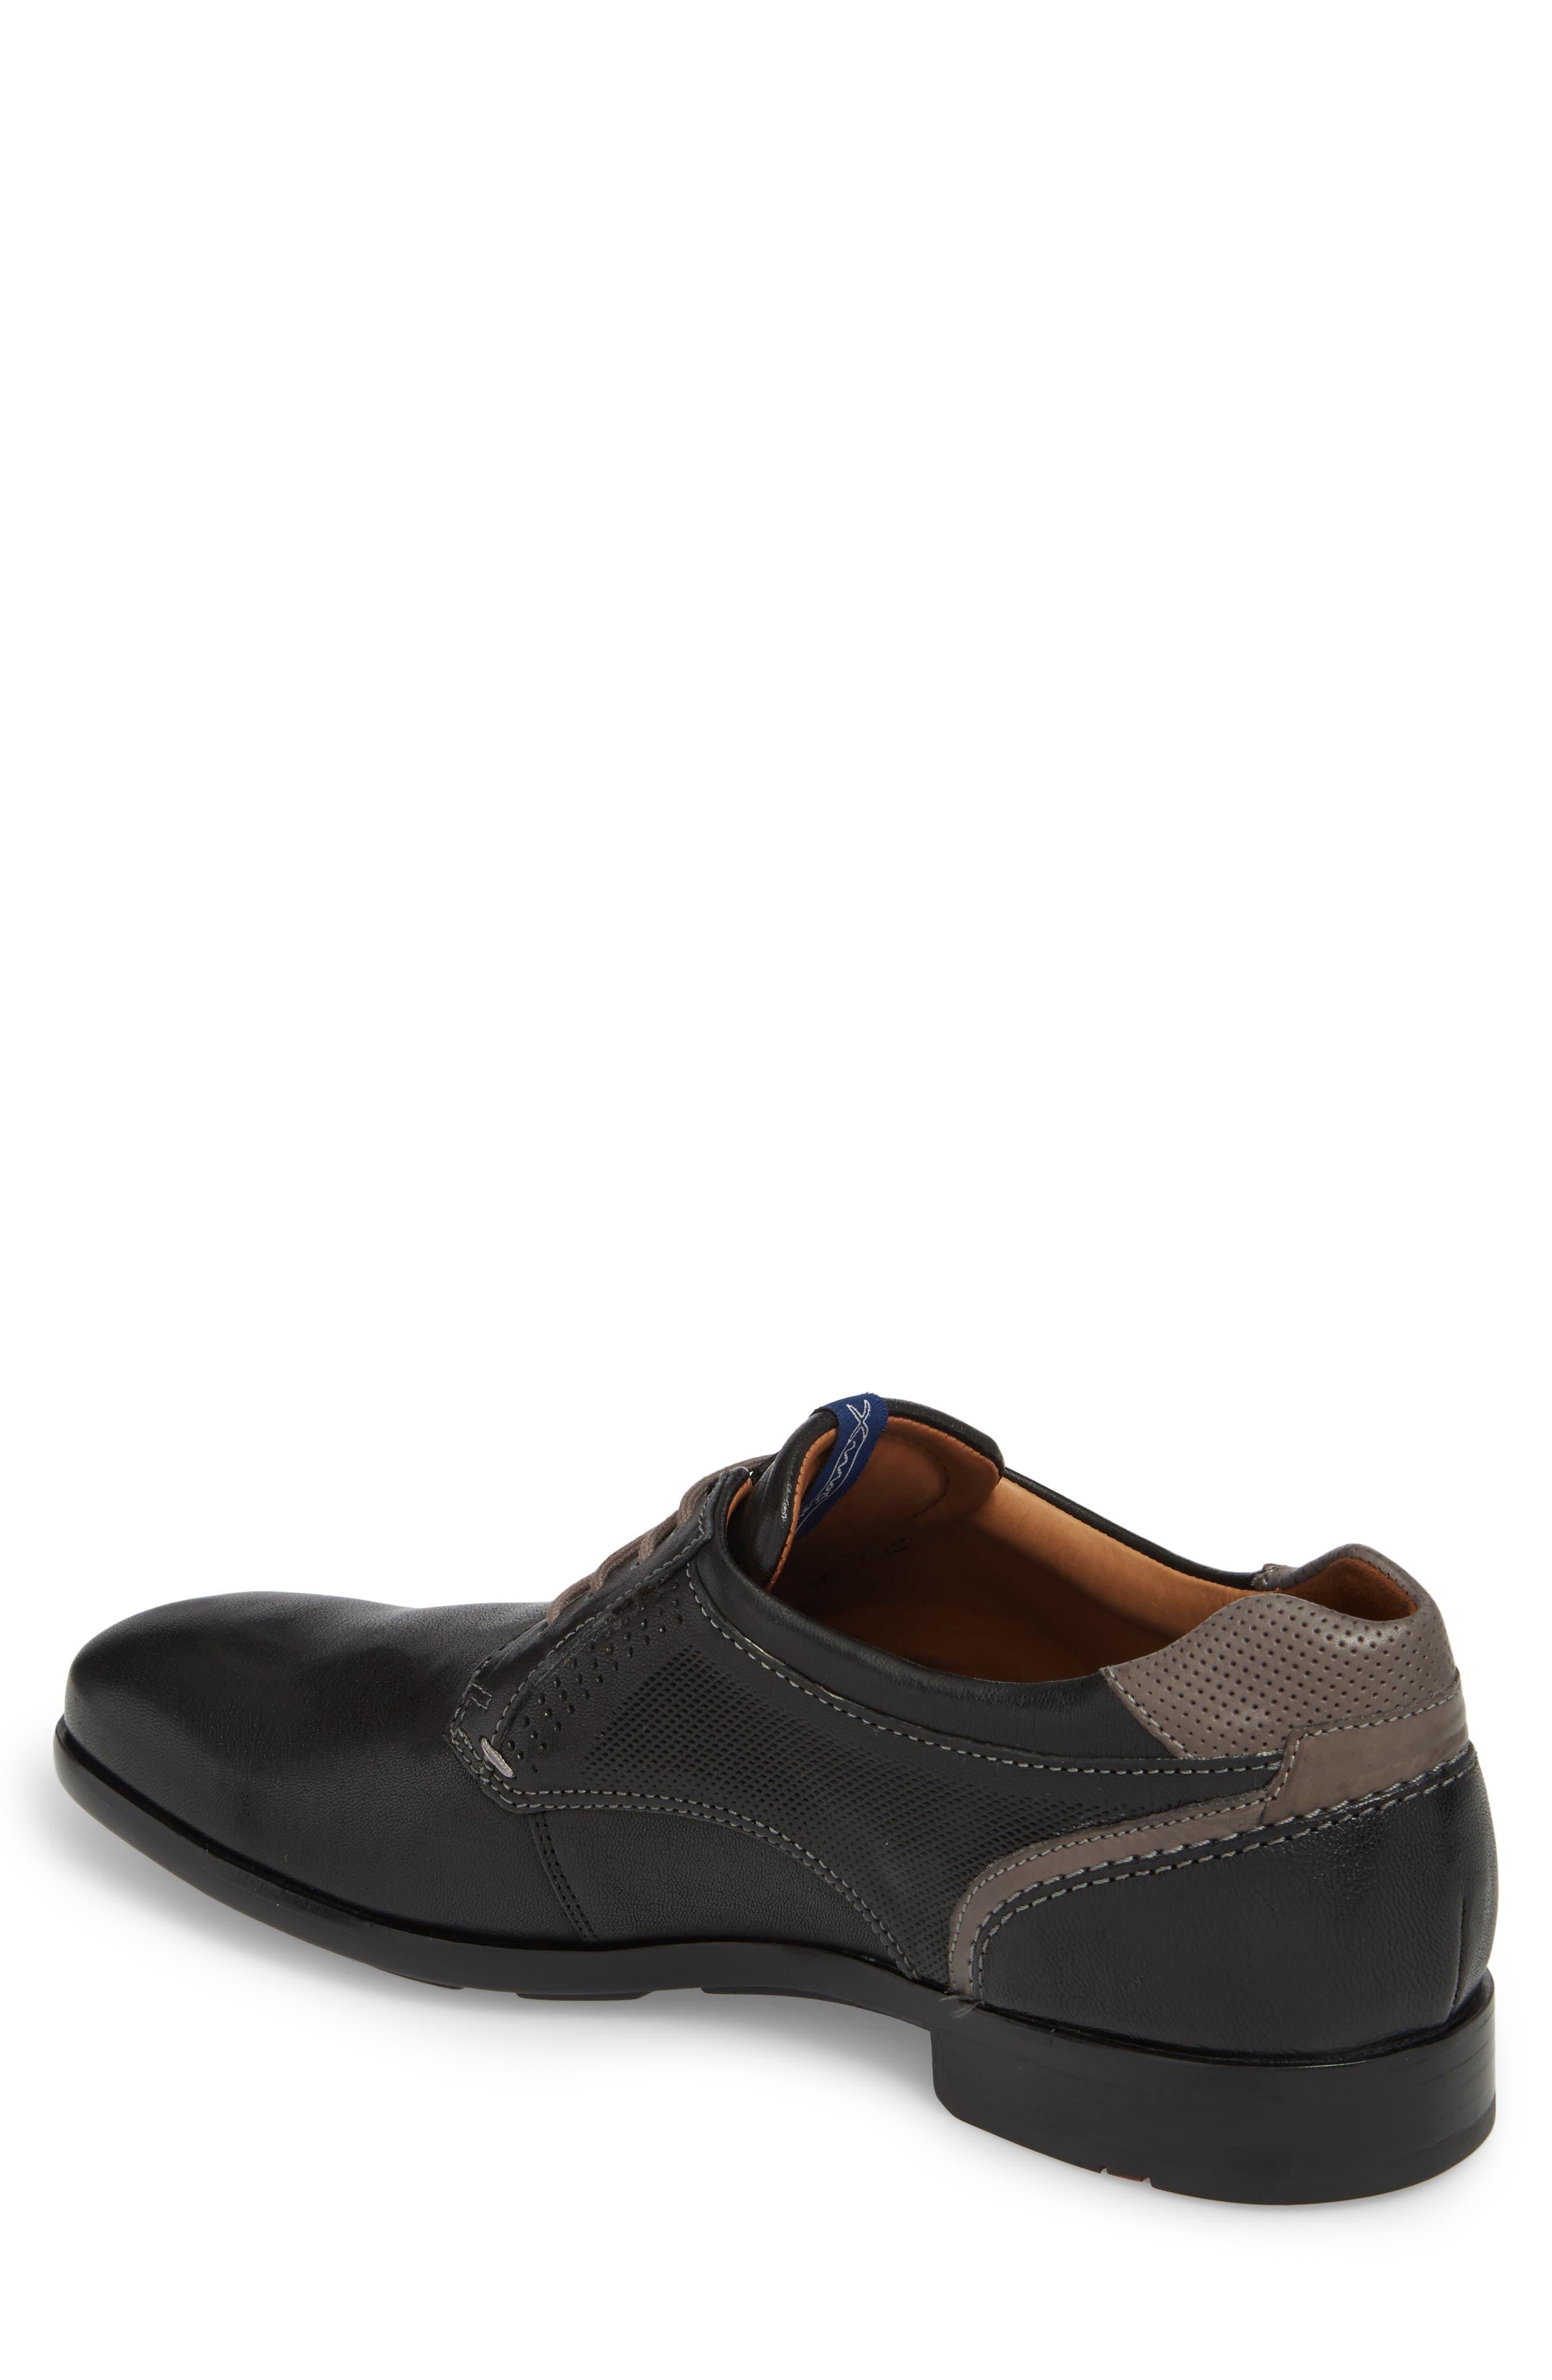 Morice Plain Toe Derby,                             Alternate thumbnail 2, color,                             BLACK/ GREY LEATHER